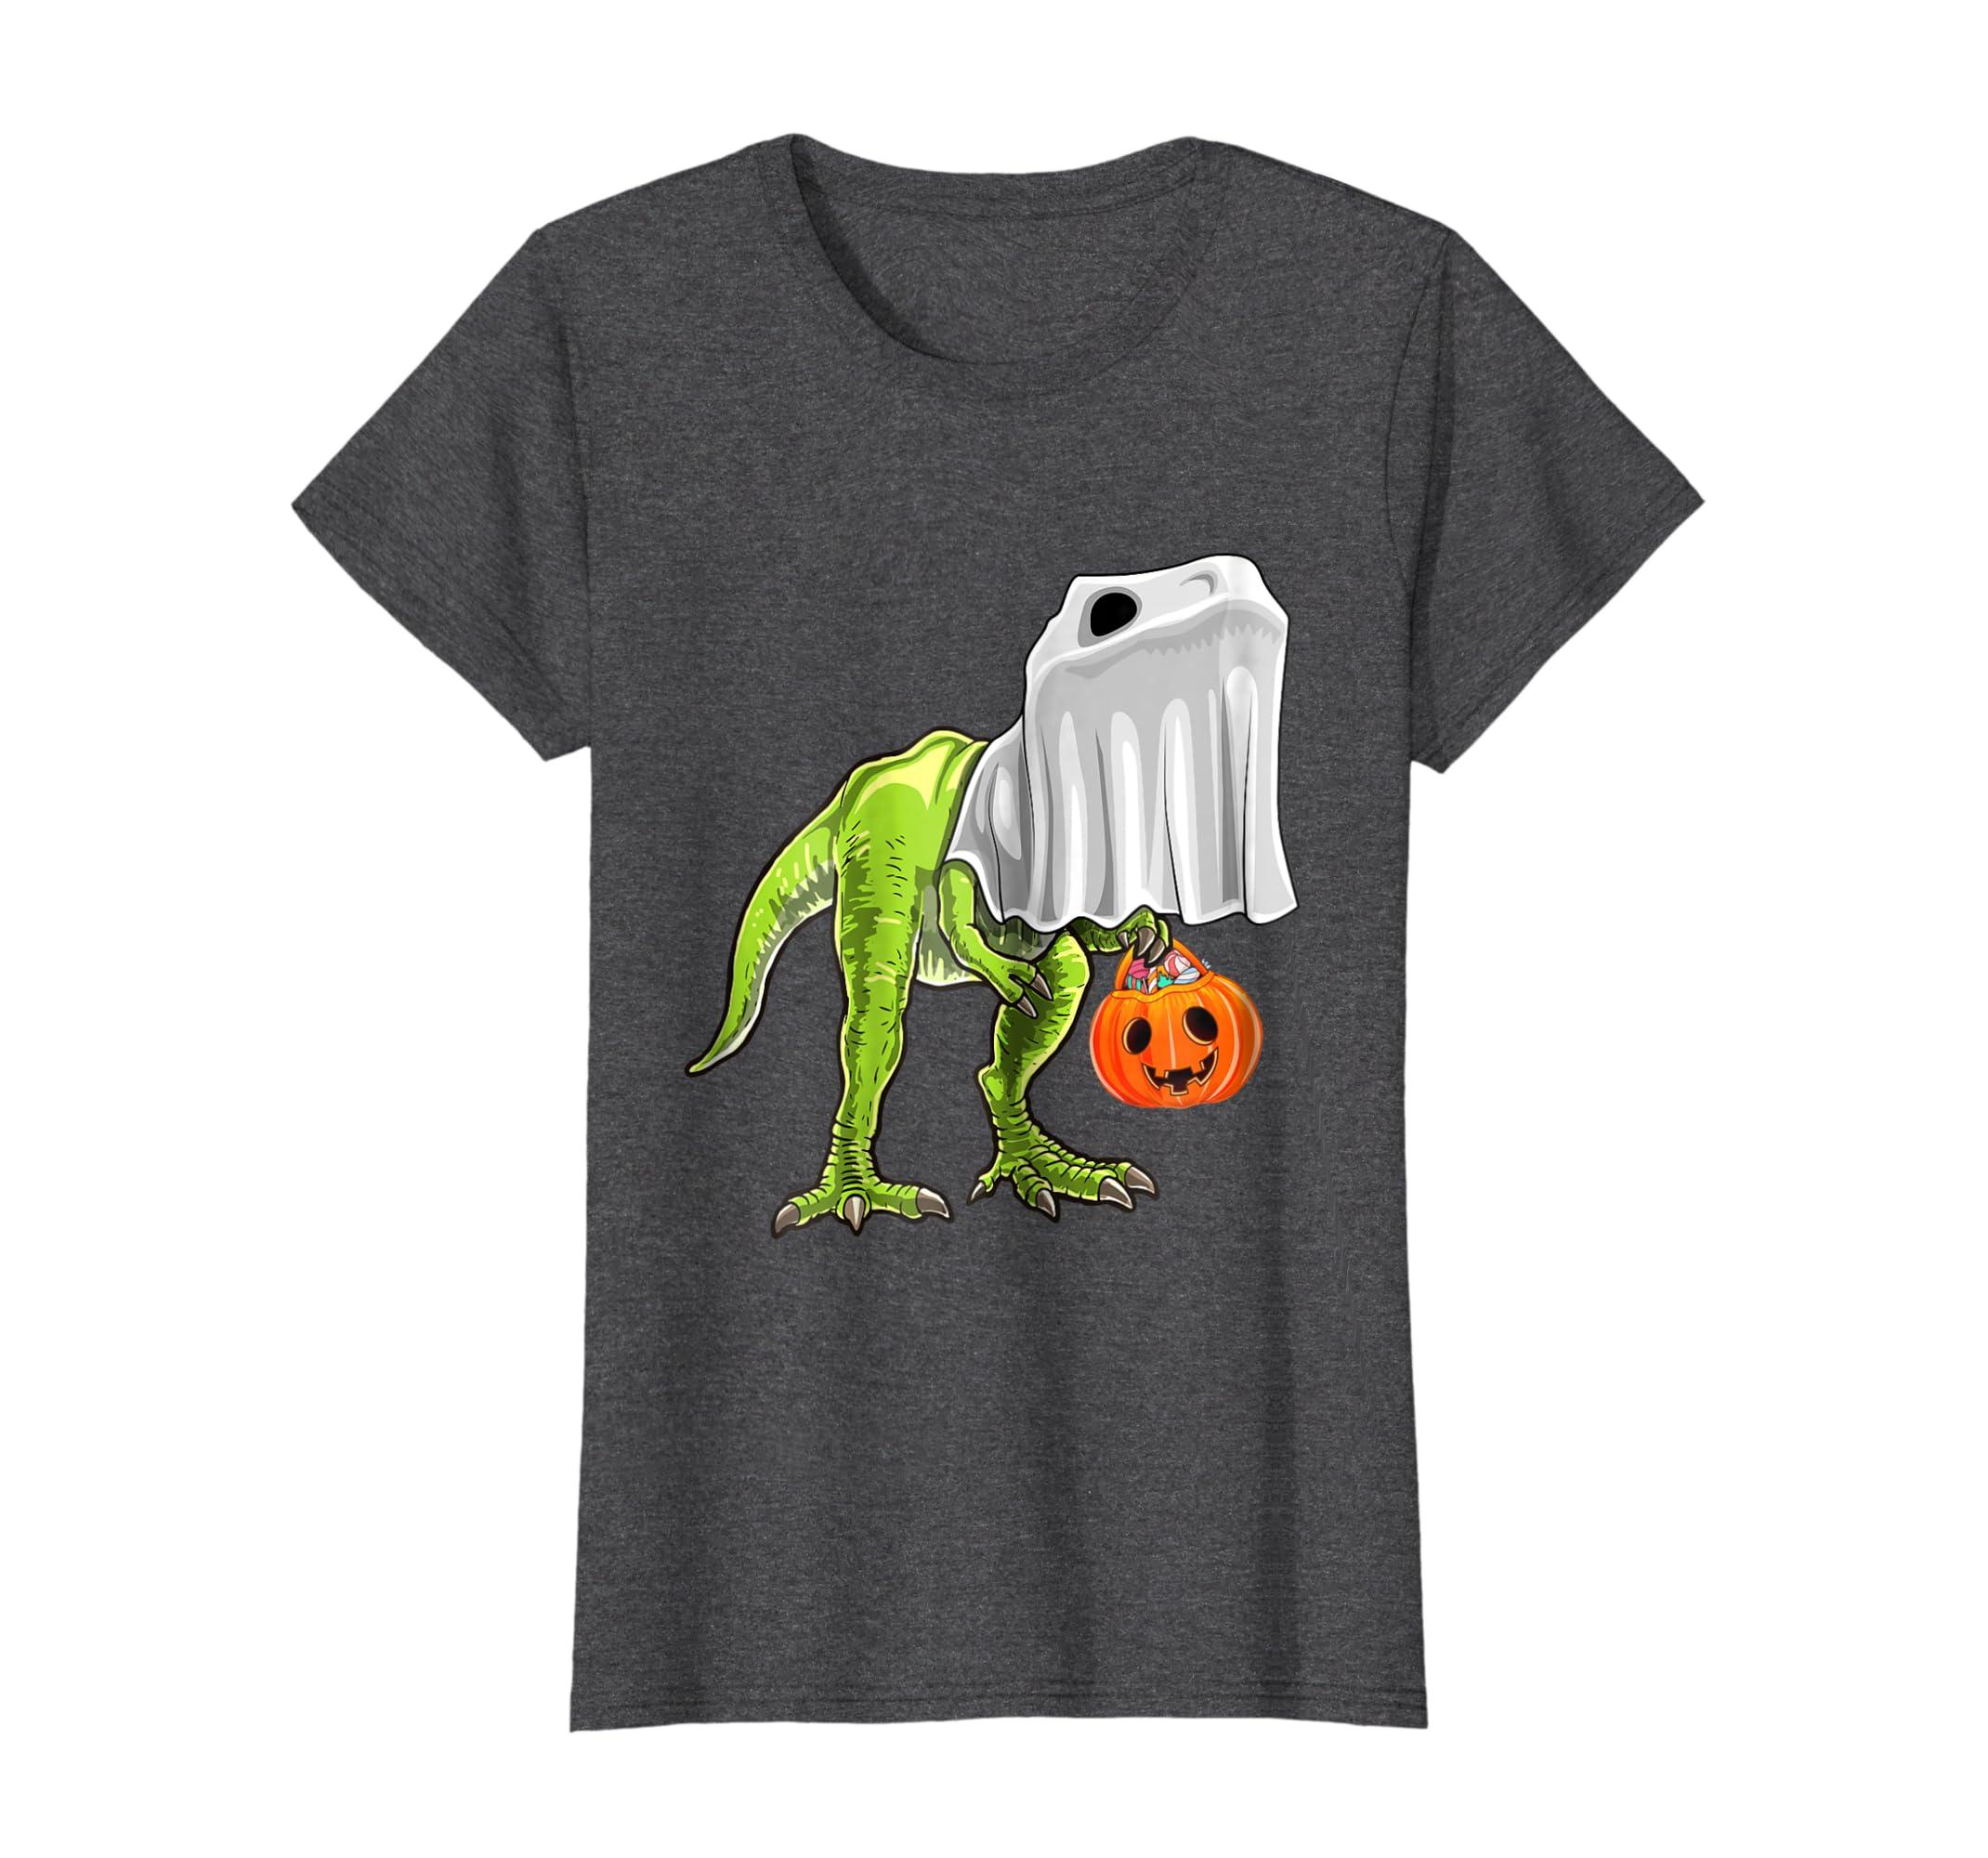 3bfbd6f4 Amazon.com: Halloween T Rex Dinosaur Ghost Trick or Treat Shirt Kids:  Clothing